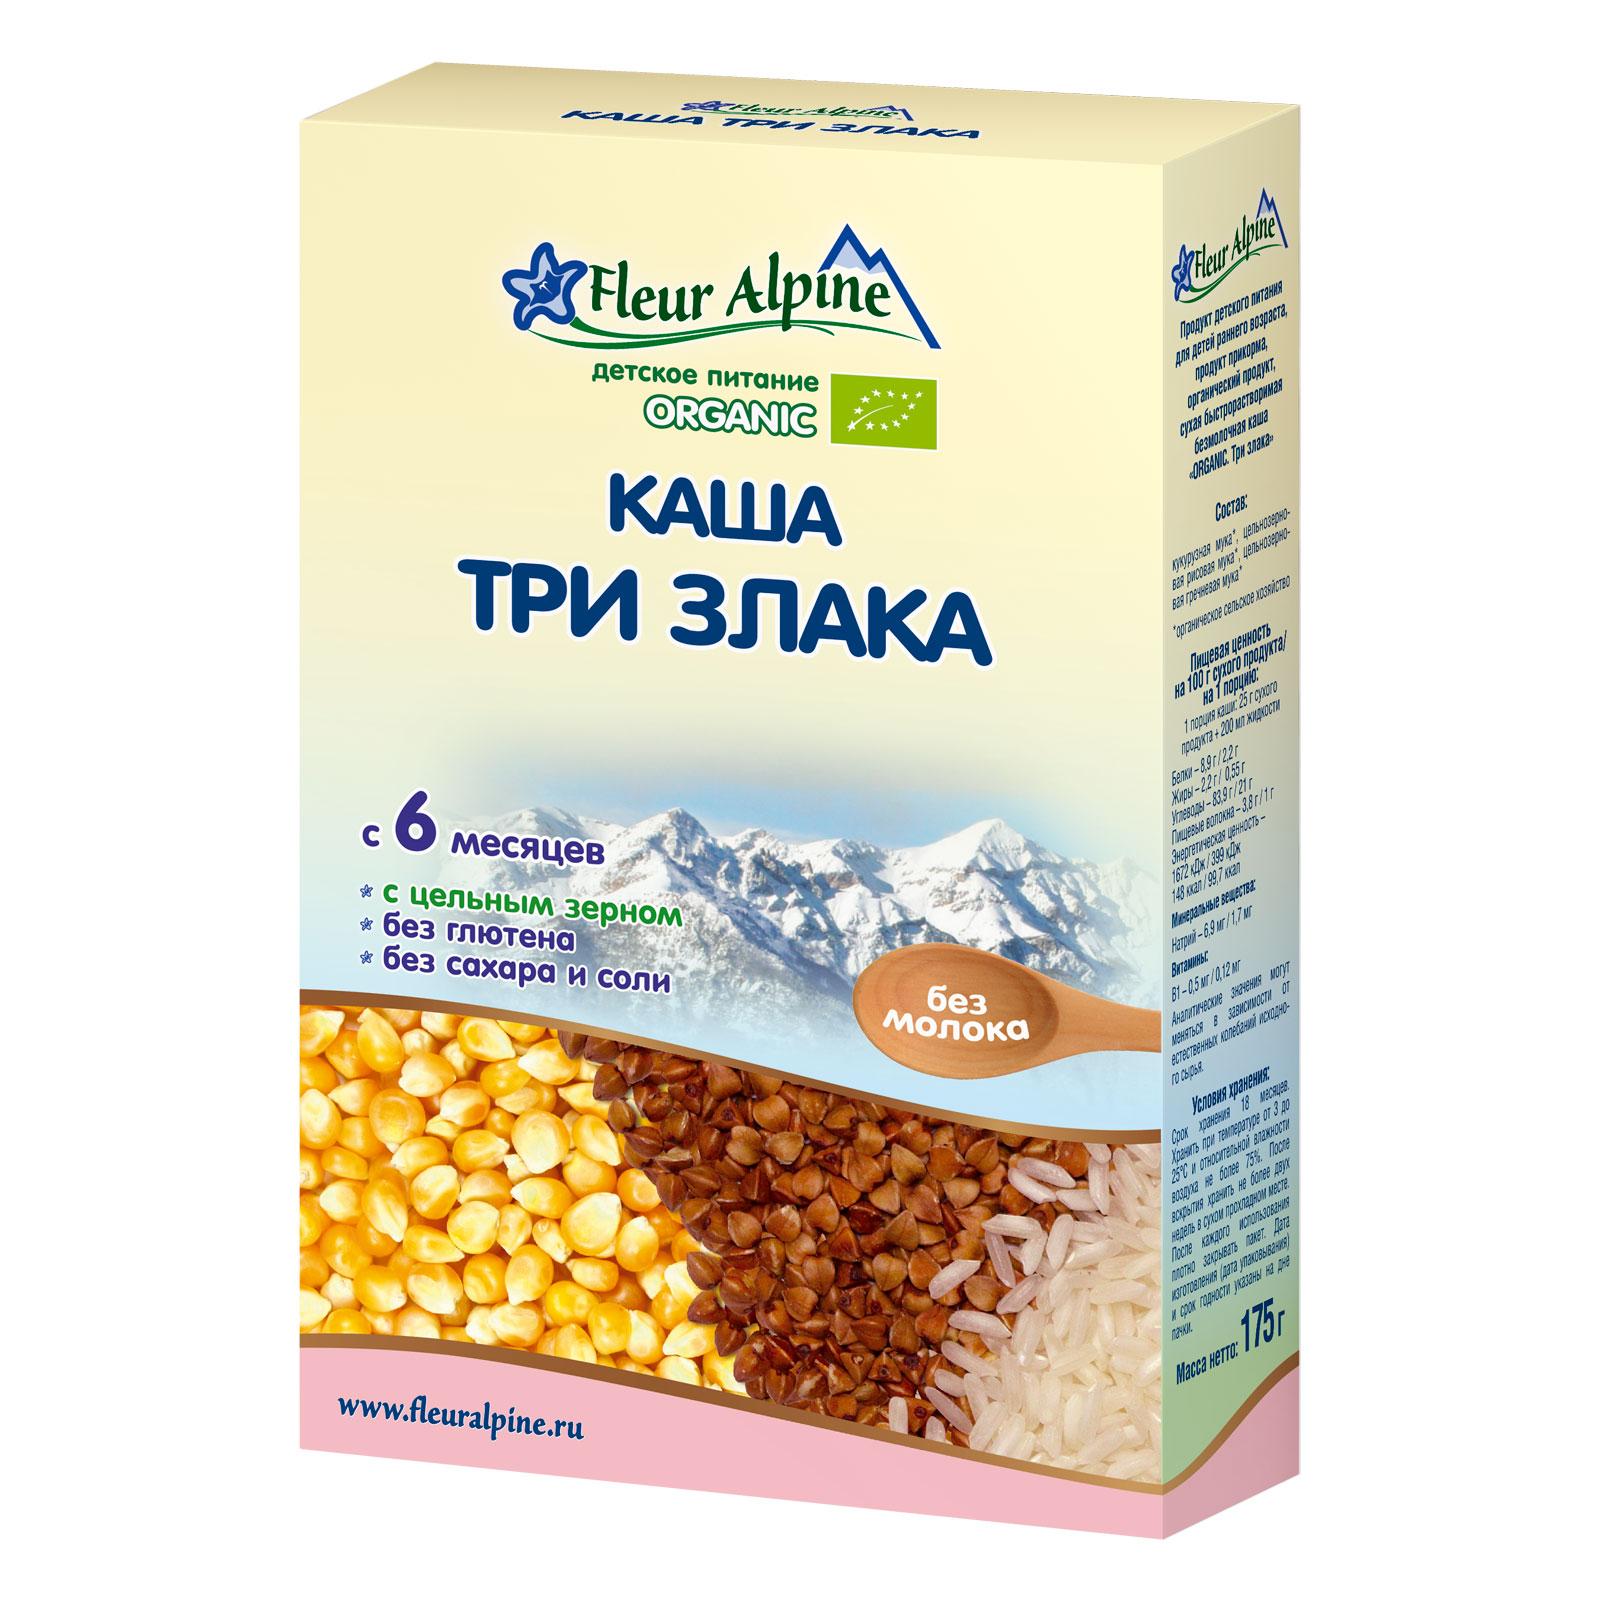 Каша Fleur Alpine Органик безмолочная 175 гр Три злака (с 6 мес)<br>